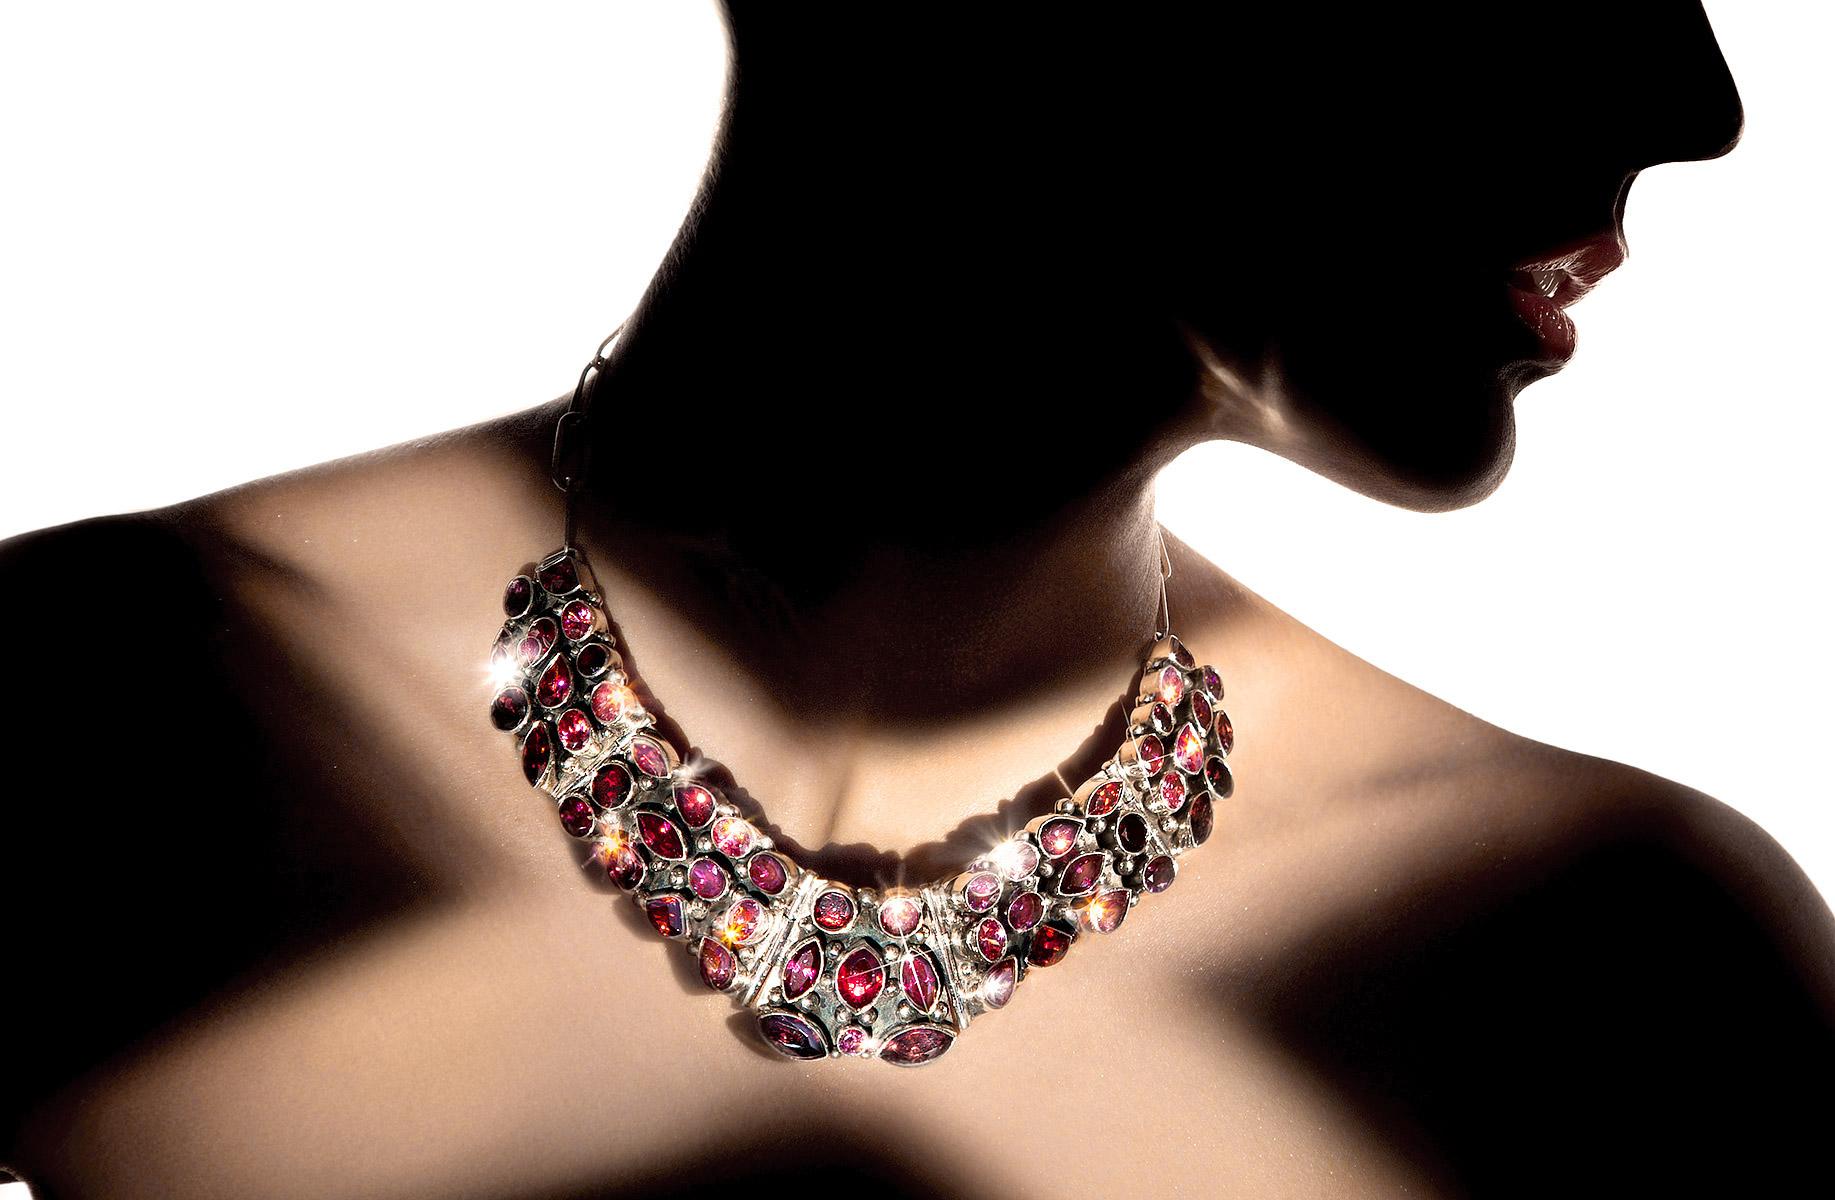 albuquerque-santa-fe-fashion-jewelery-photo-29.jpg